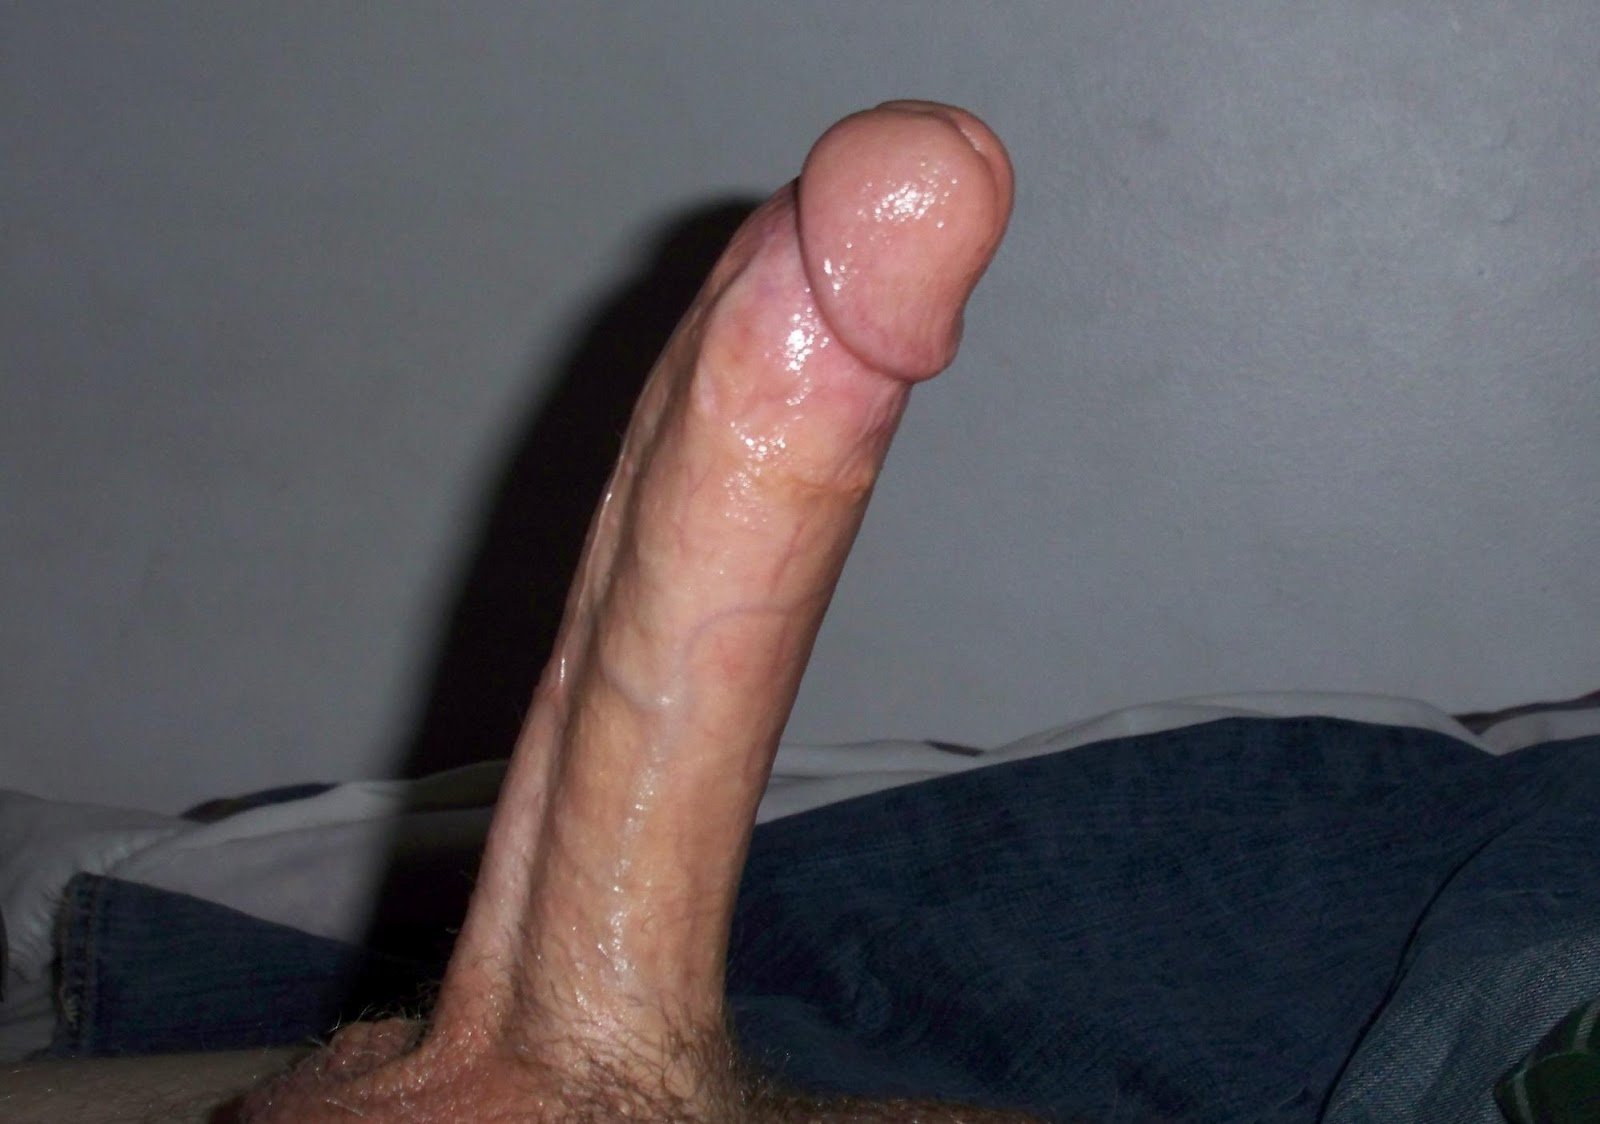 hot jerk nice cock jpg 1500x1000